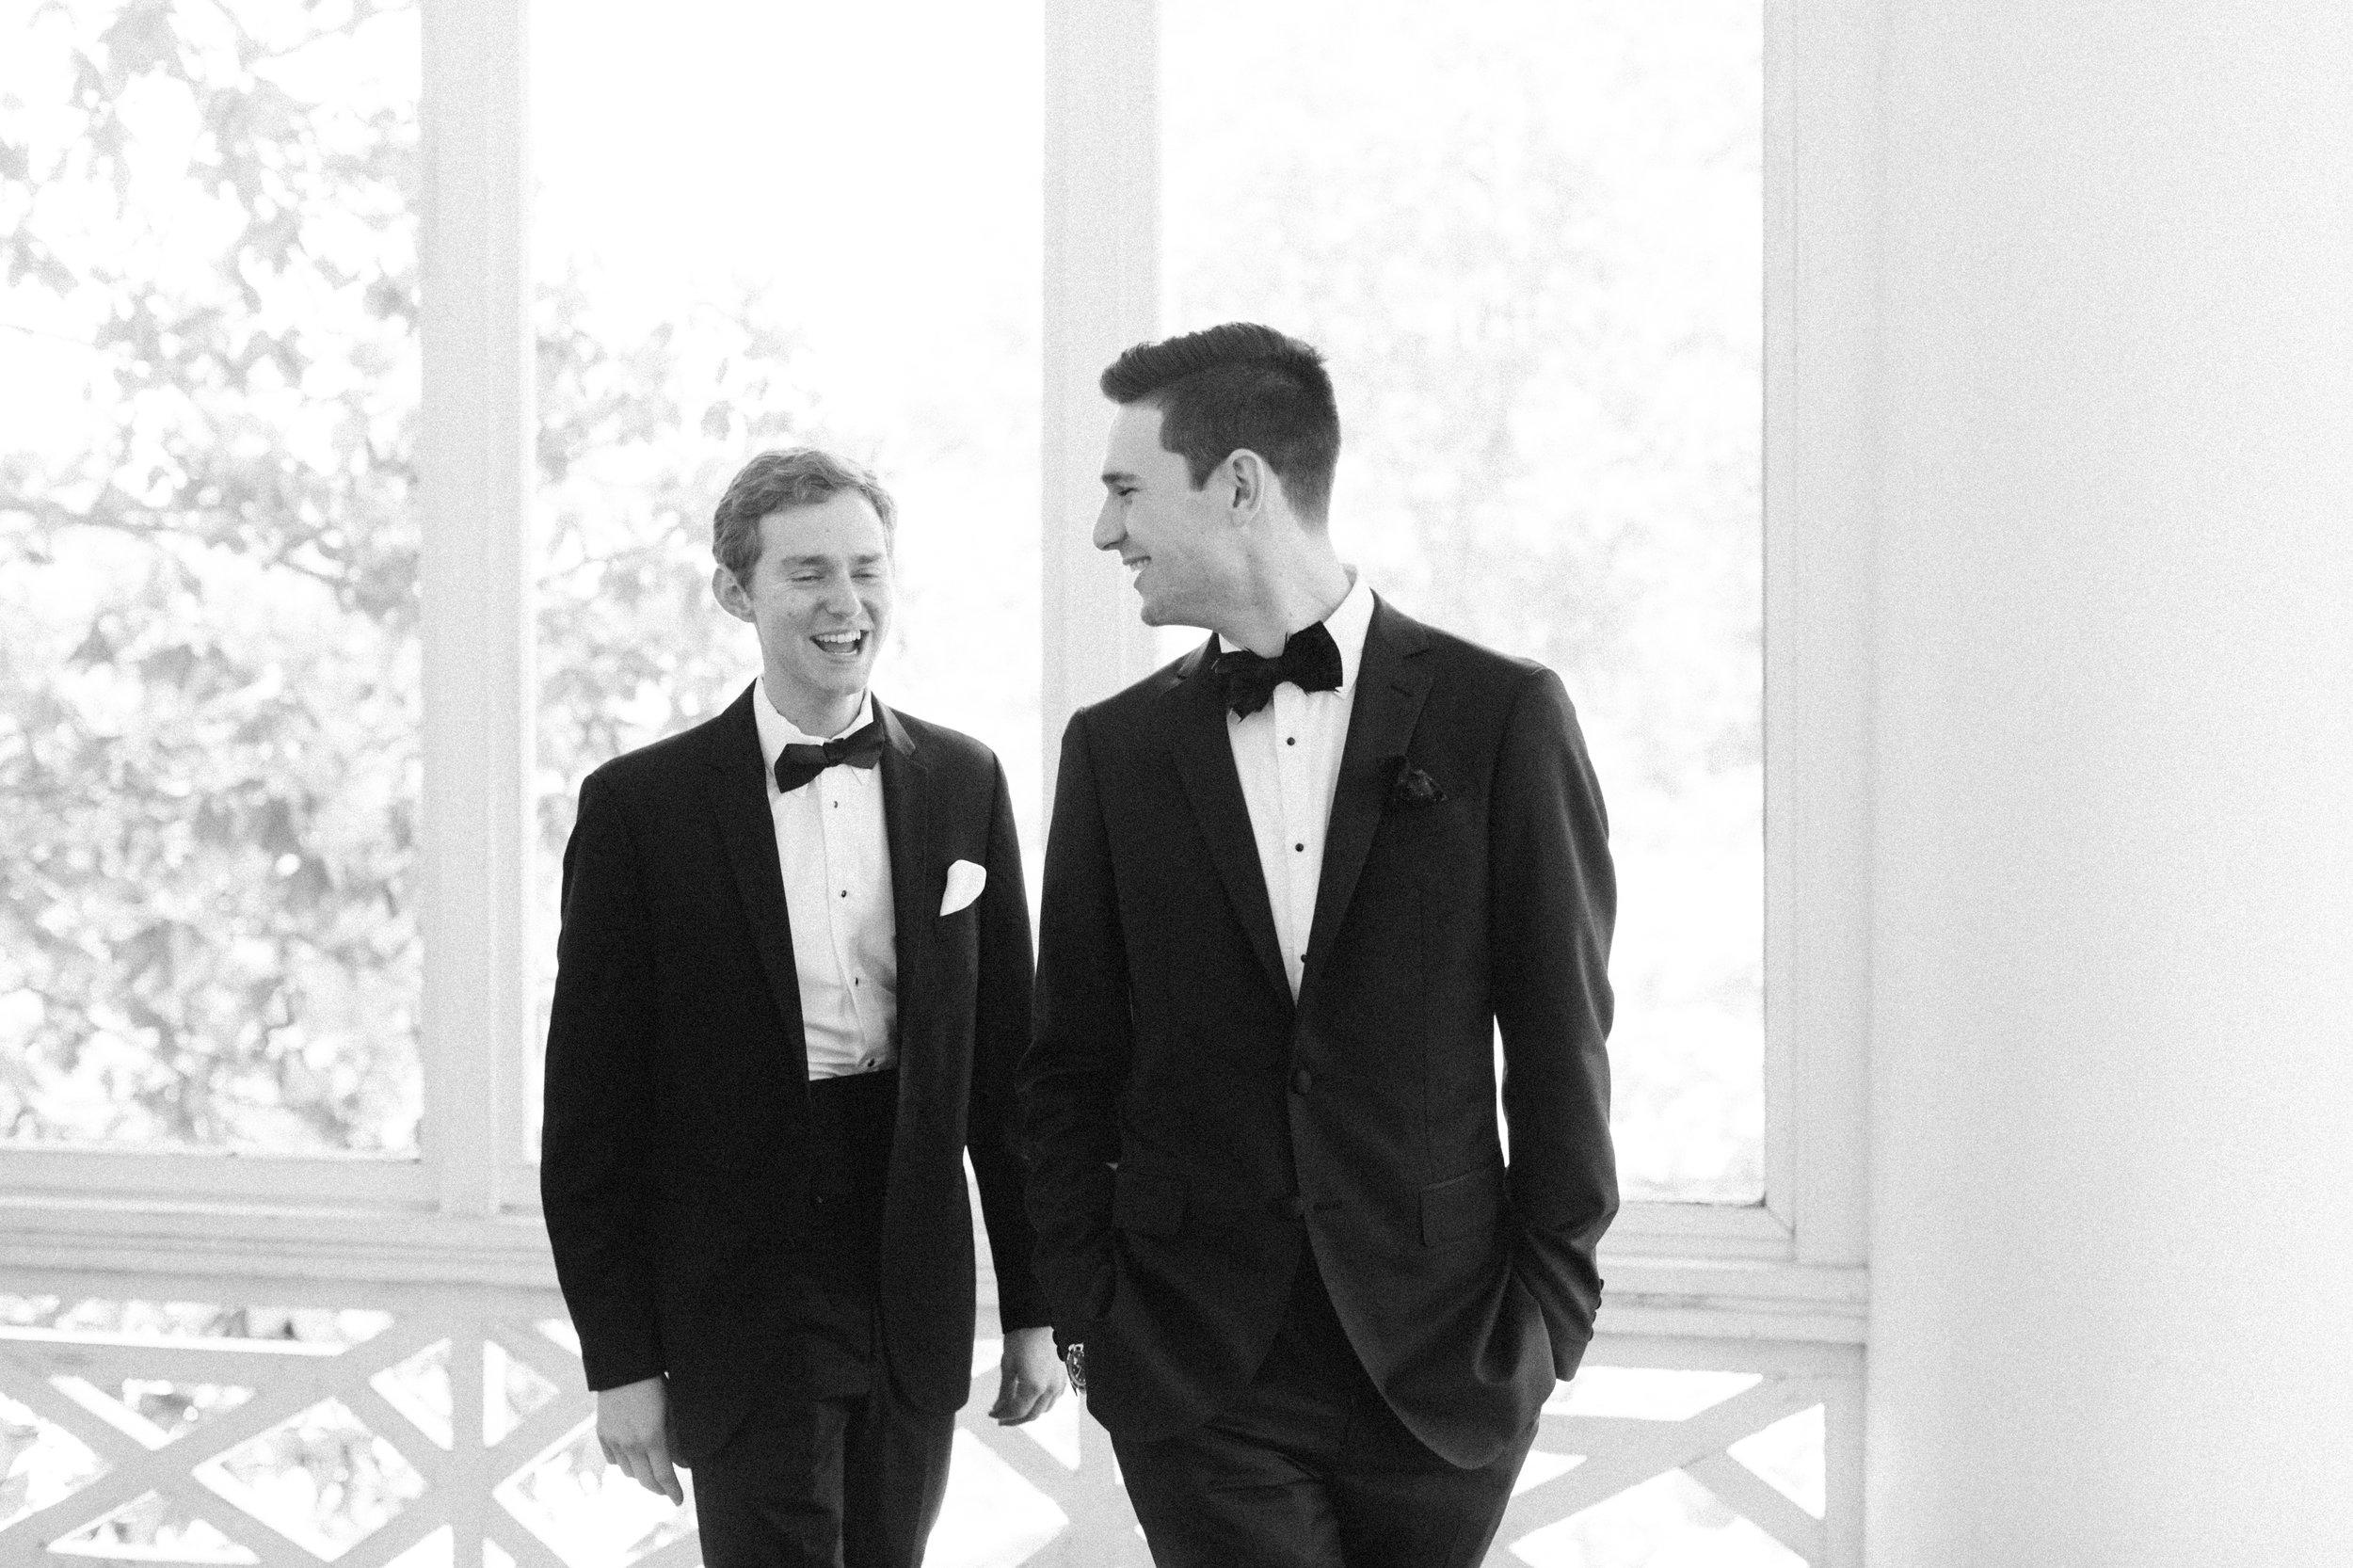 Marie_Perry_Duke_Mansion_Wedding_Charlotte_NC_Abigail_Malone_Photography-109.jpg